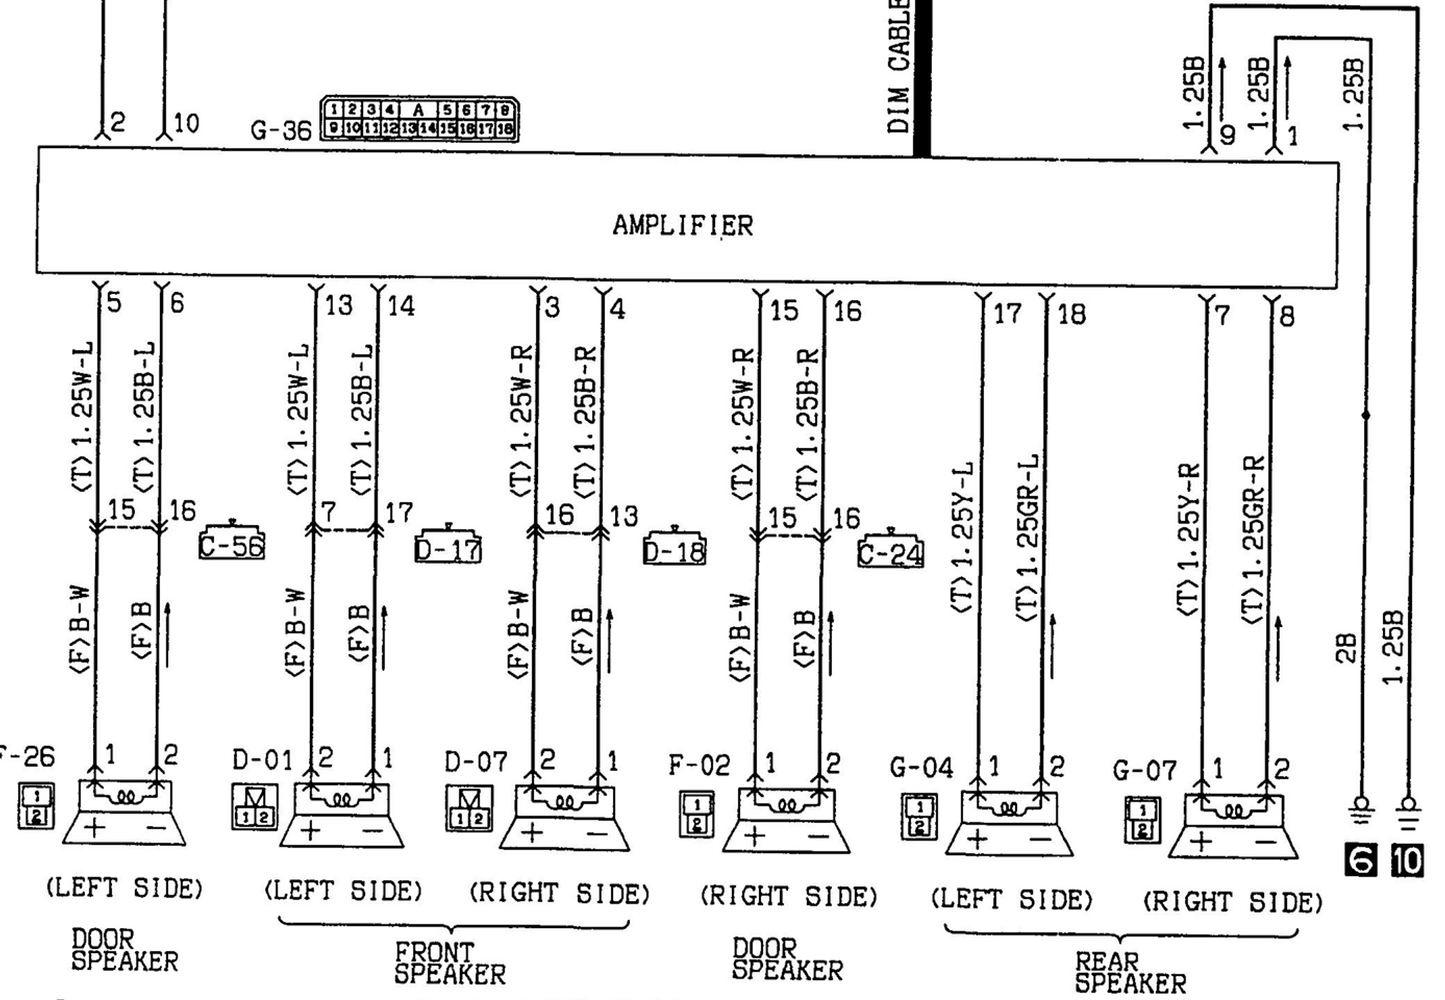 Mitsubishi Expo Wiring Diagram. Mitsubishi. Free Wiring